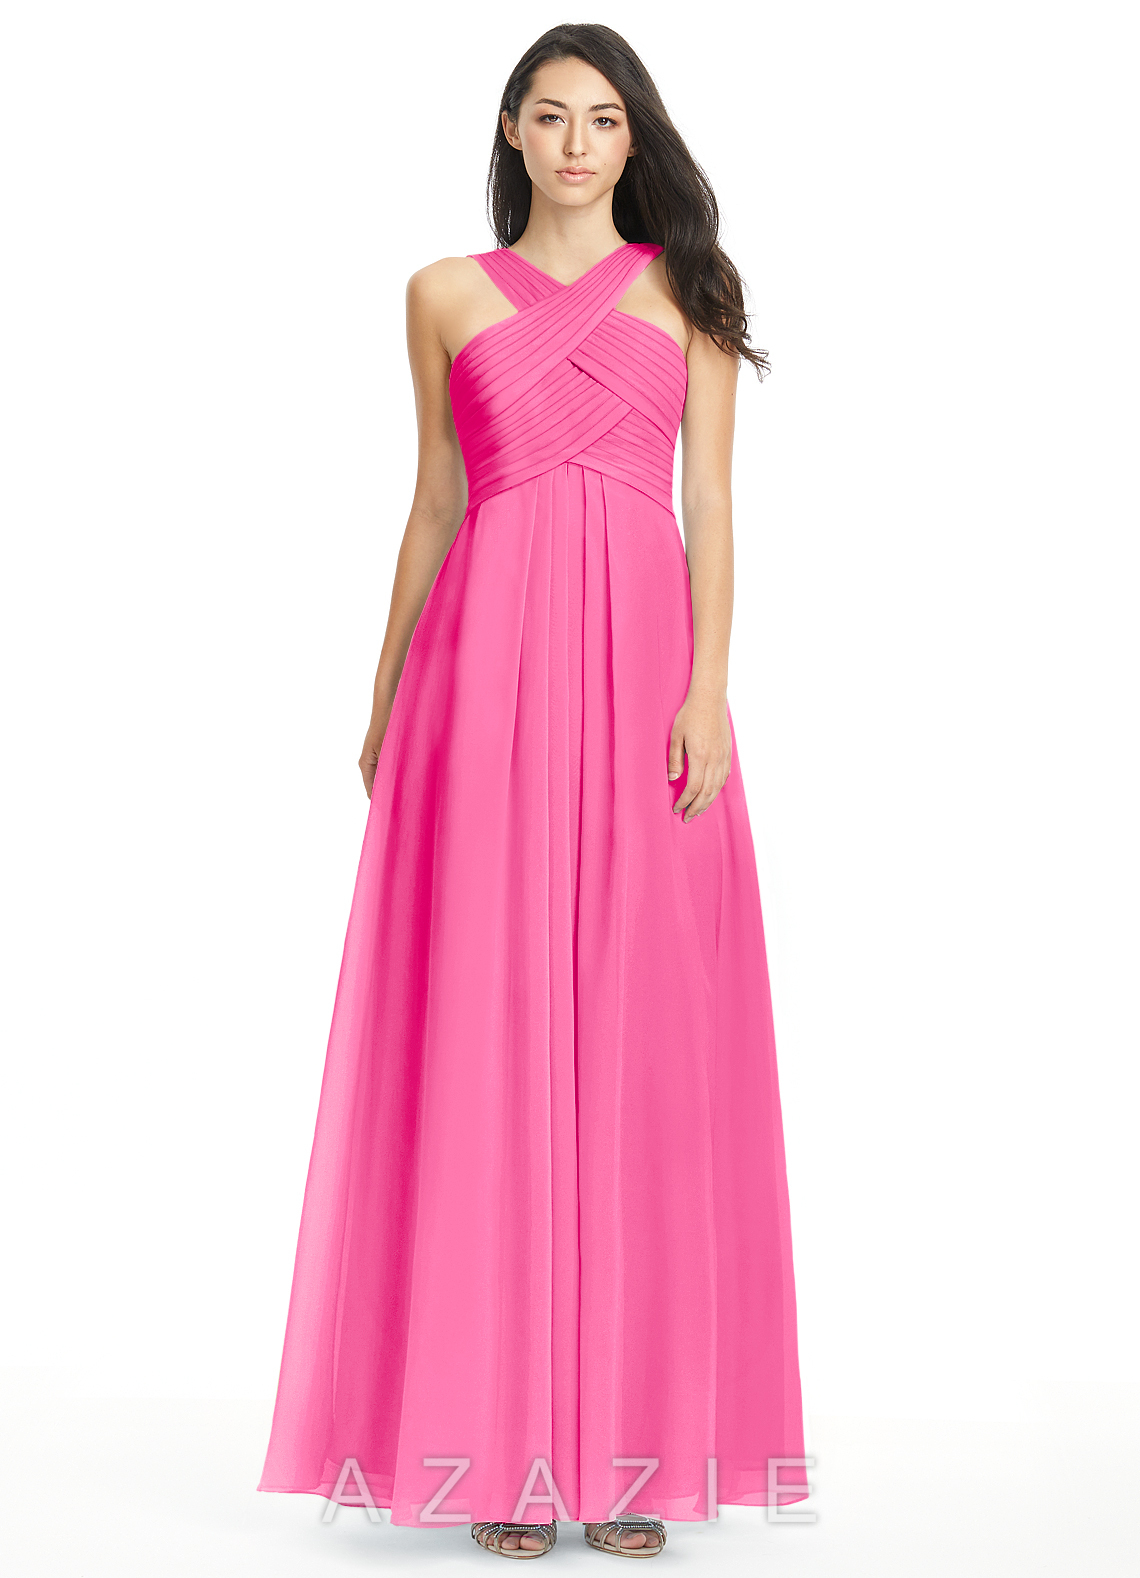 Azalea bridesmaid dresses azalea gowns azazie azazie kaleigh azazie kaleigh ombrellifo Gallery